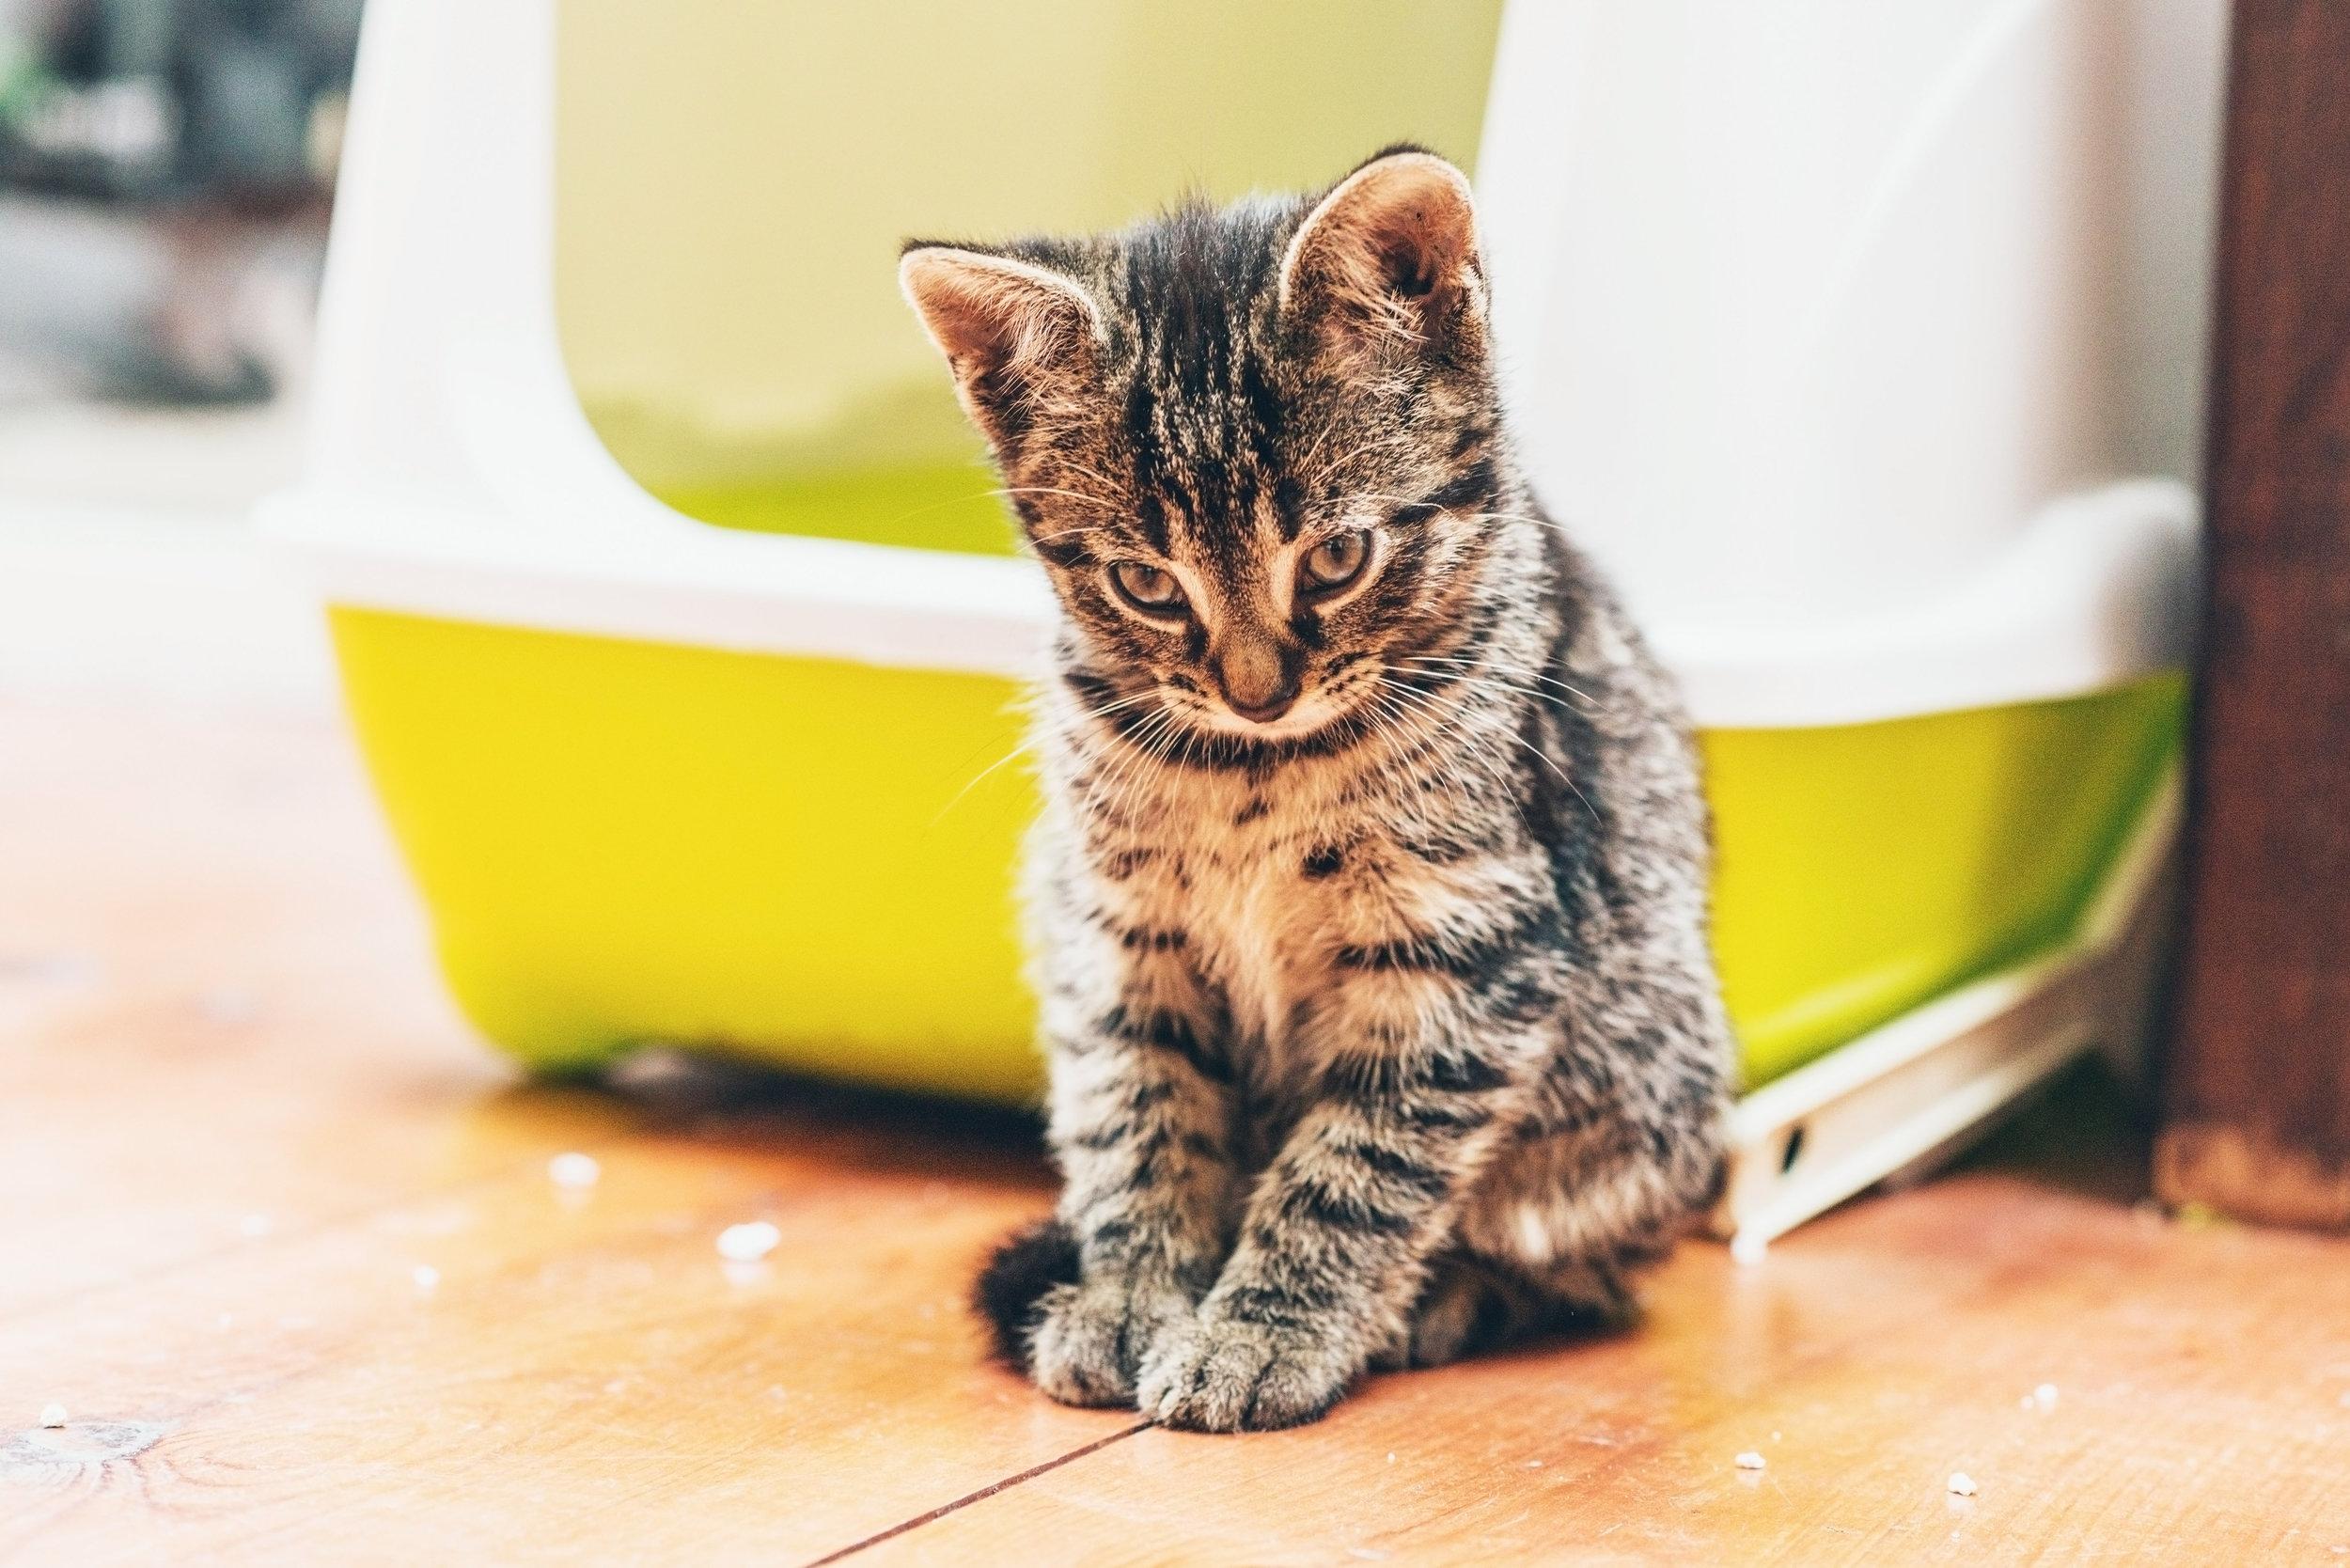 cat pee floor bed couch rug urine